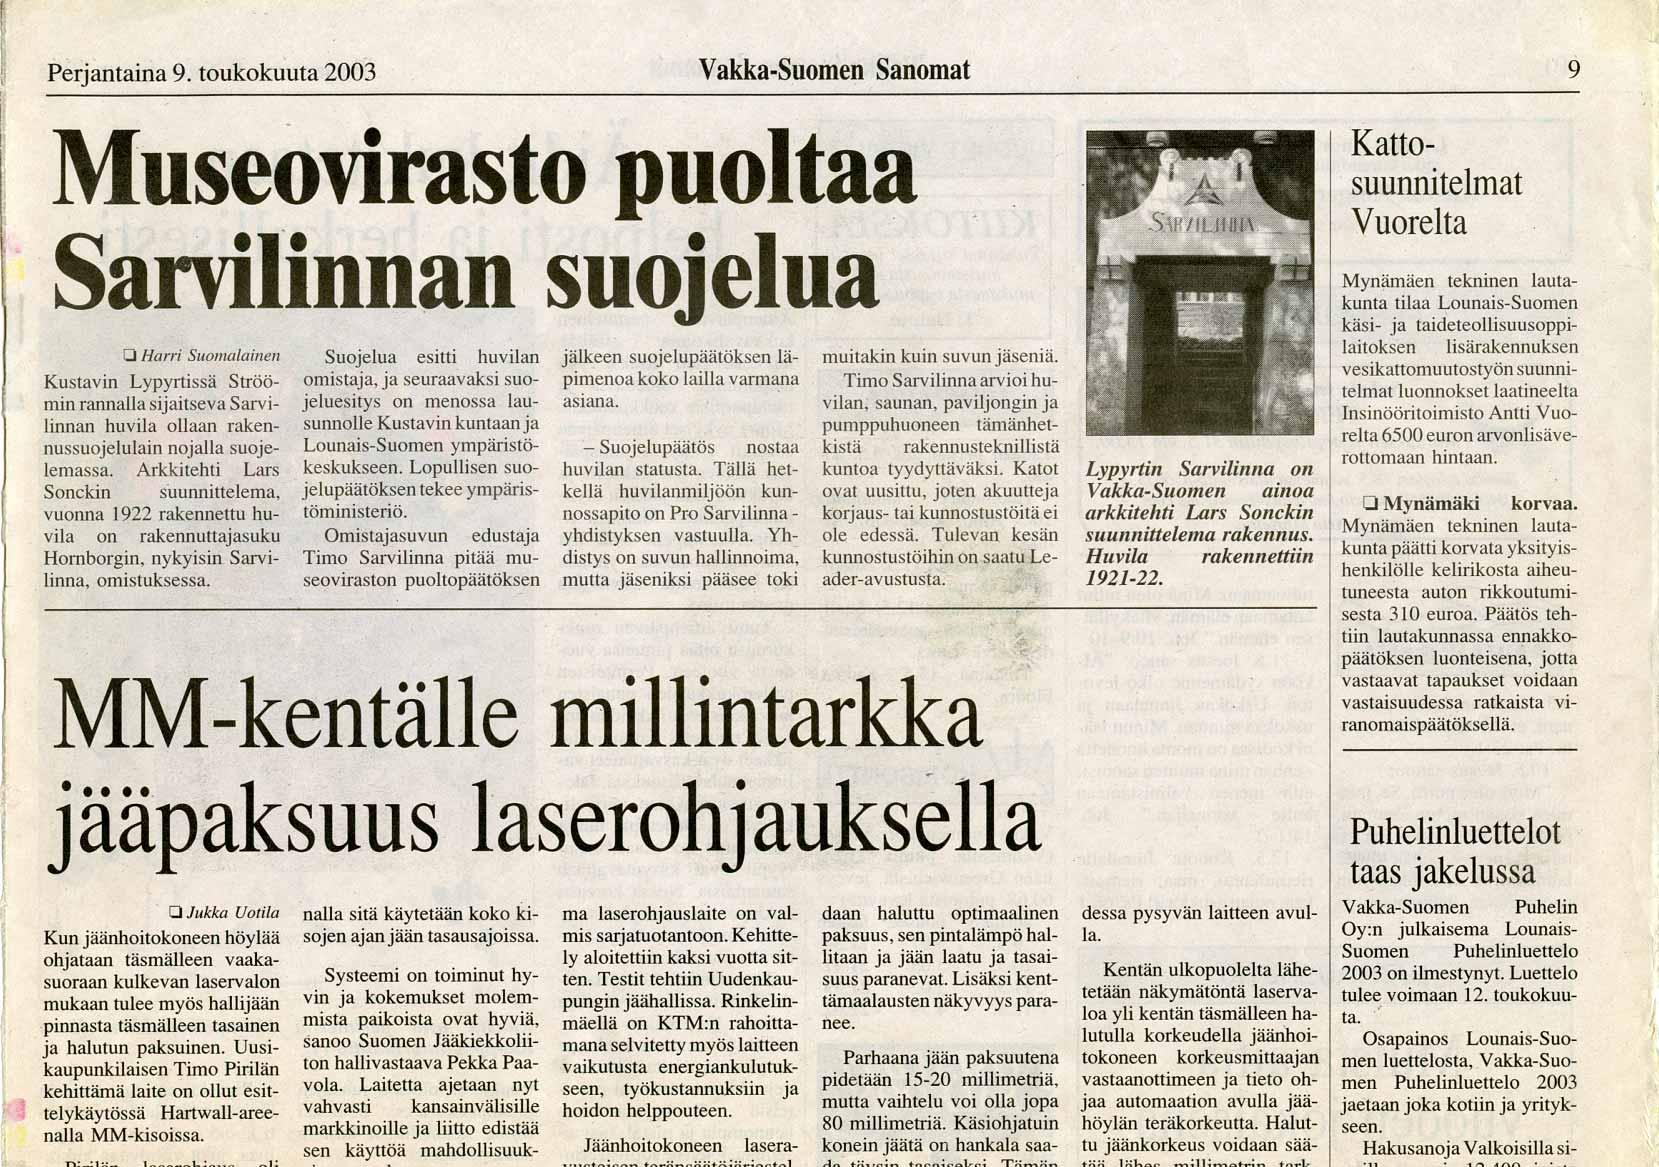 Vakka-Suomen Sanomat 9 May 2003